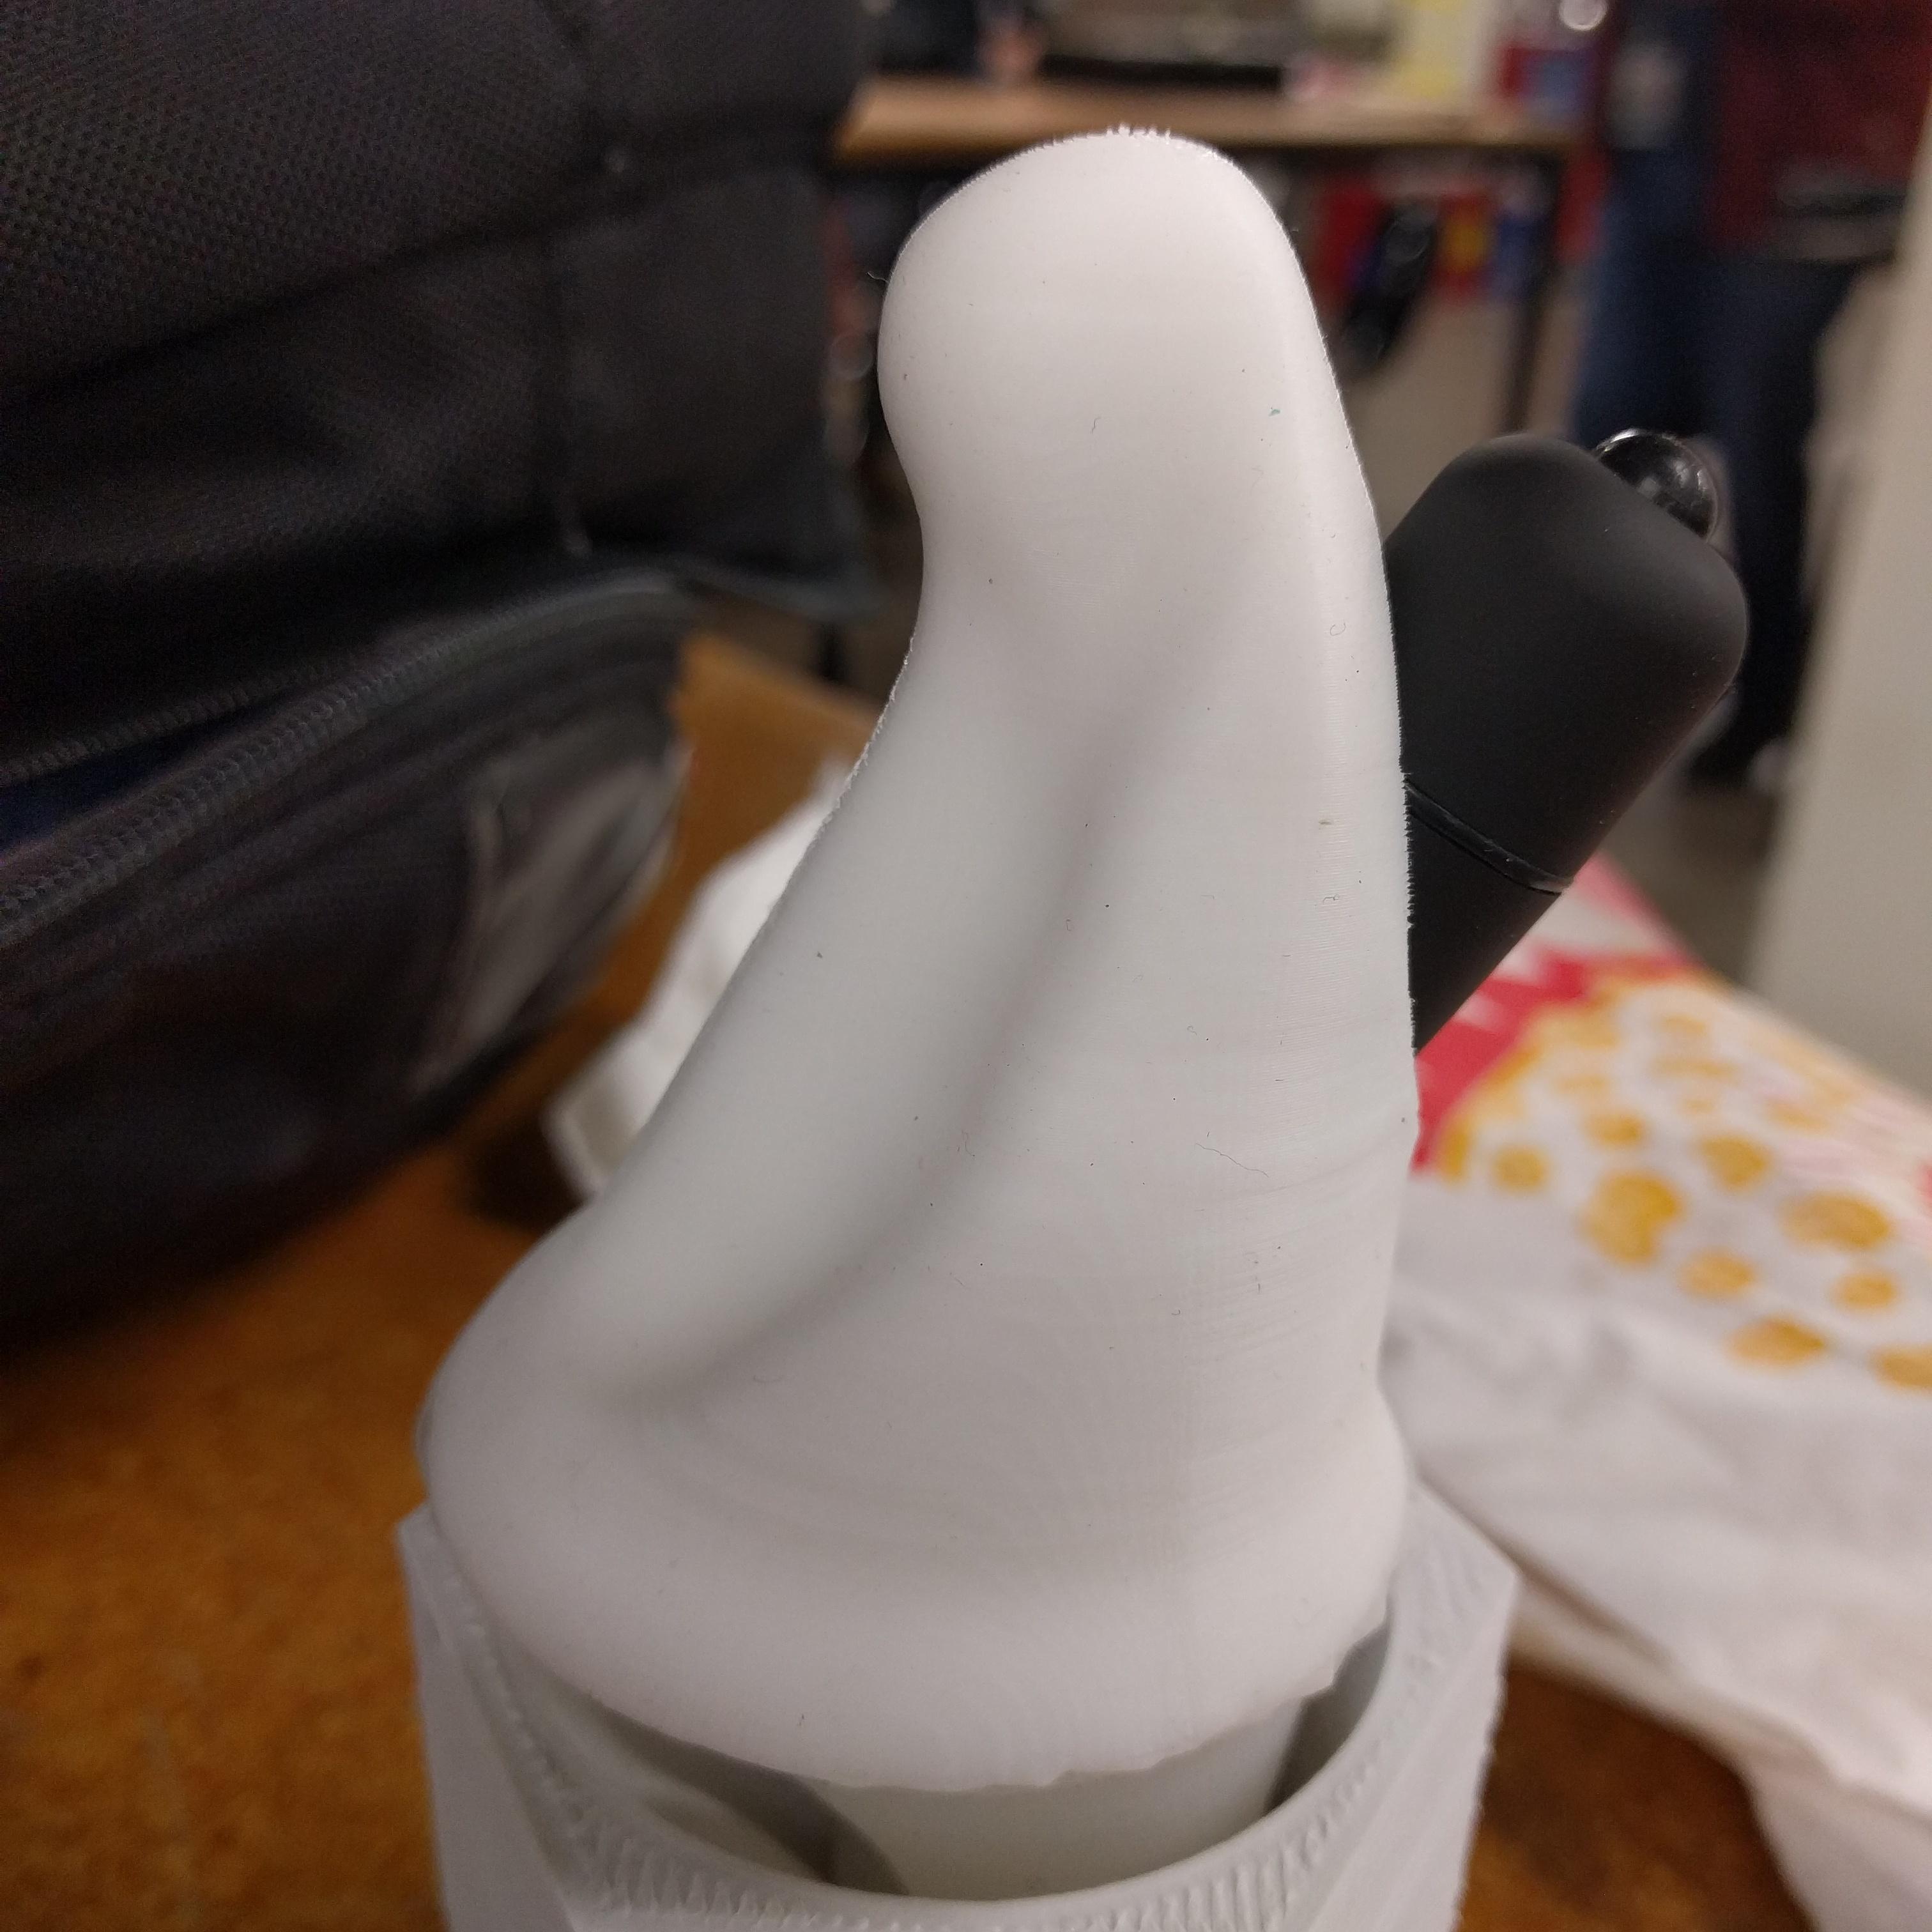 Pommel prototype